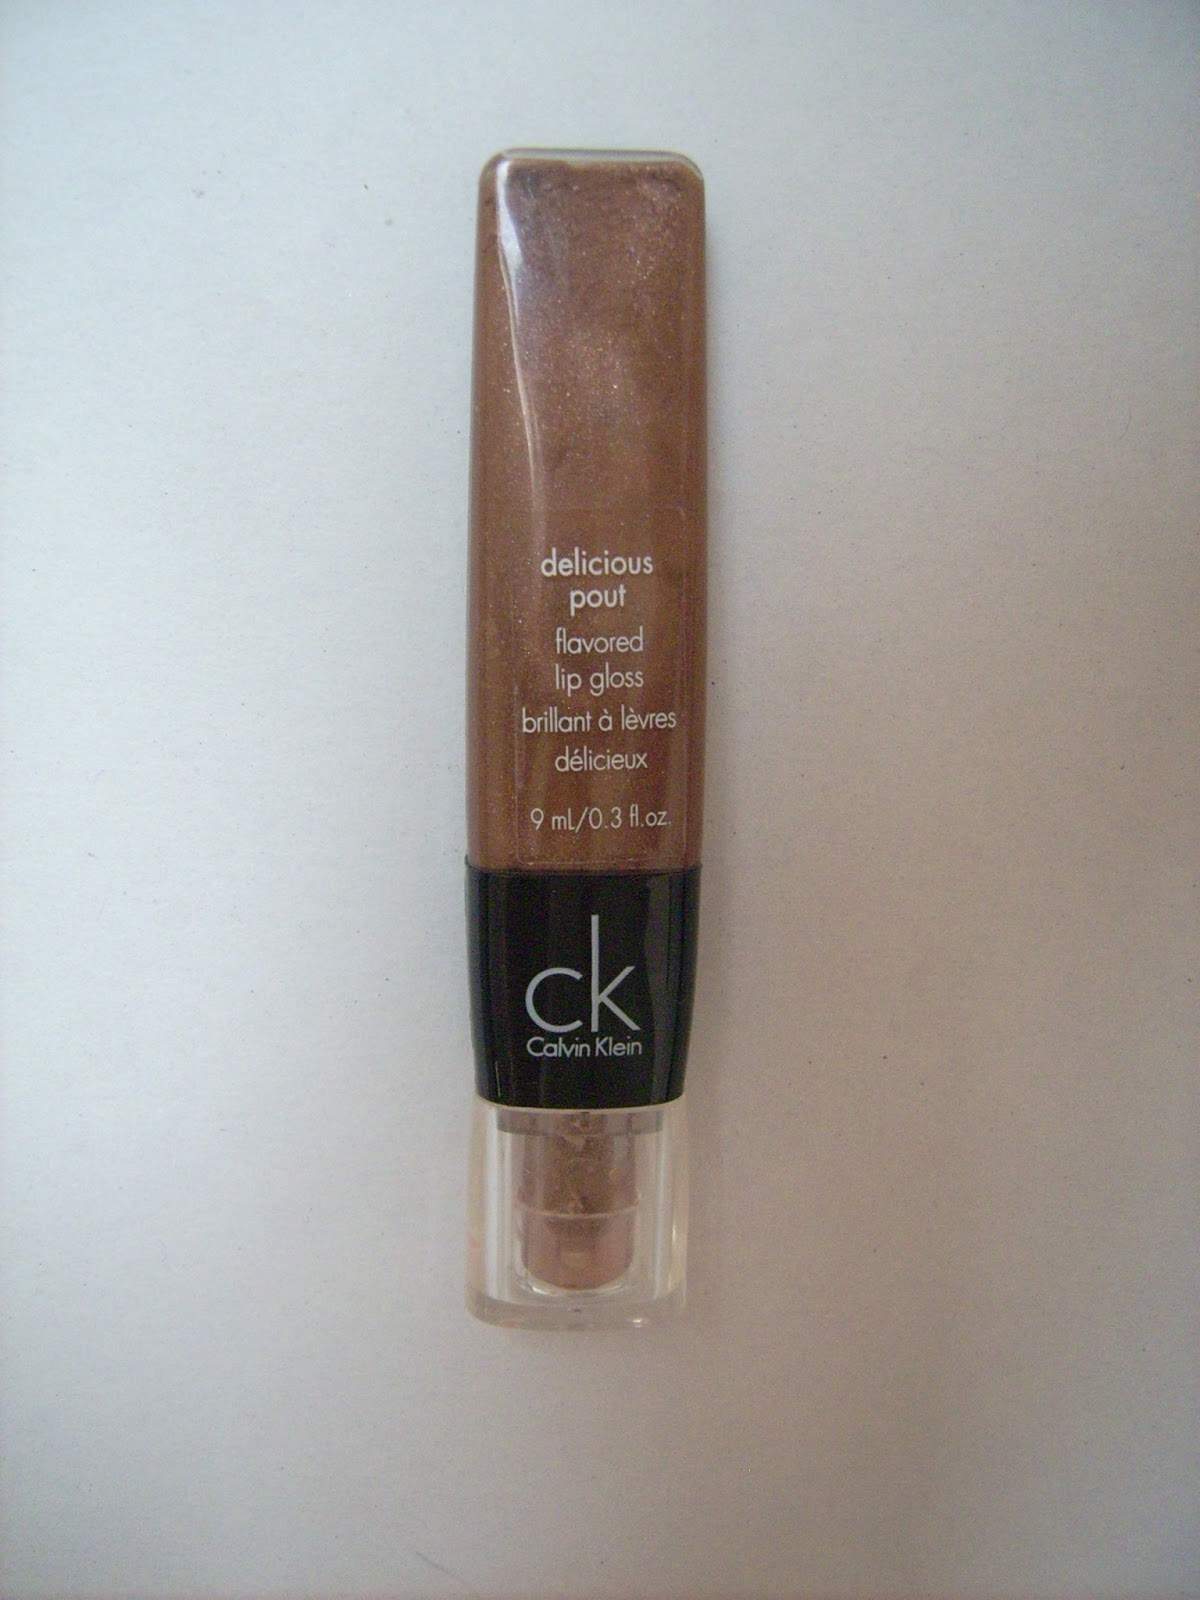 lipgloss delicious pout Calvin Klein dew drop